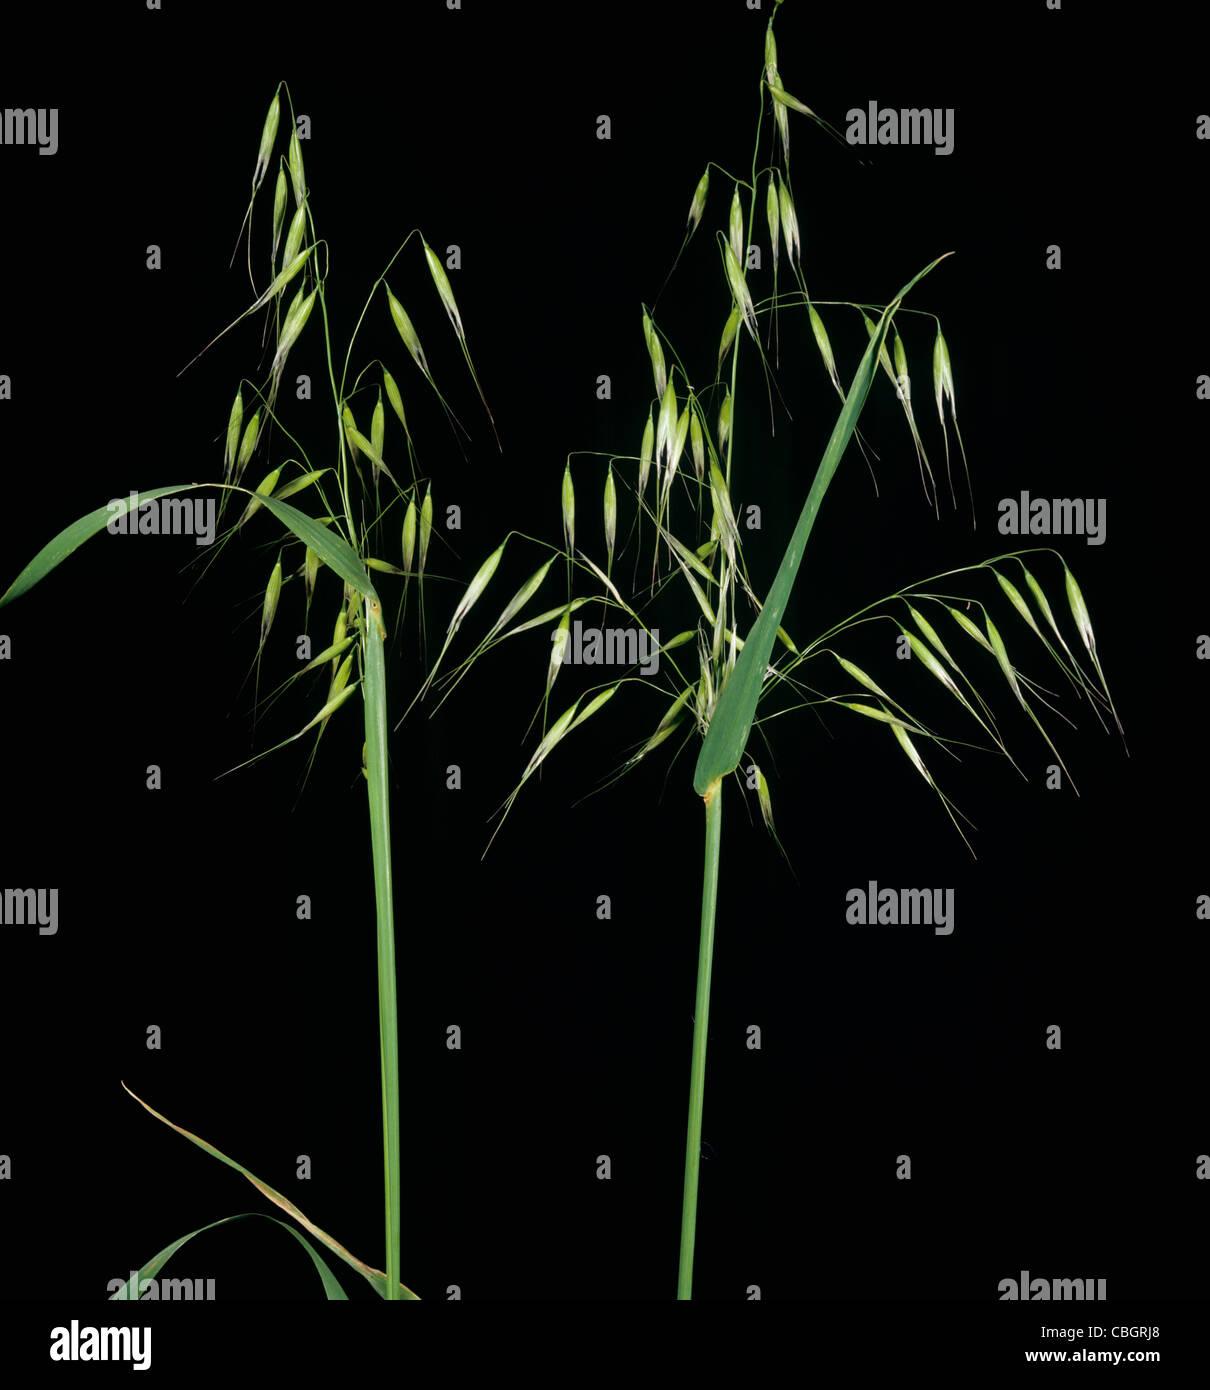 Wild oats (Avenua fatua) panicles against a studio black background Stock Photo